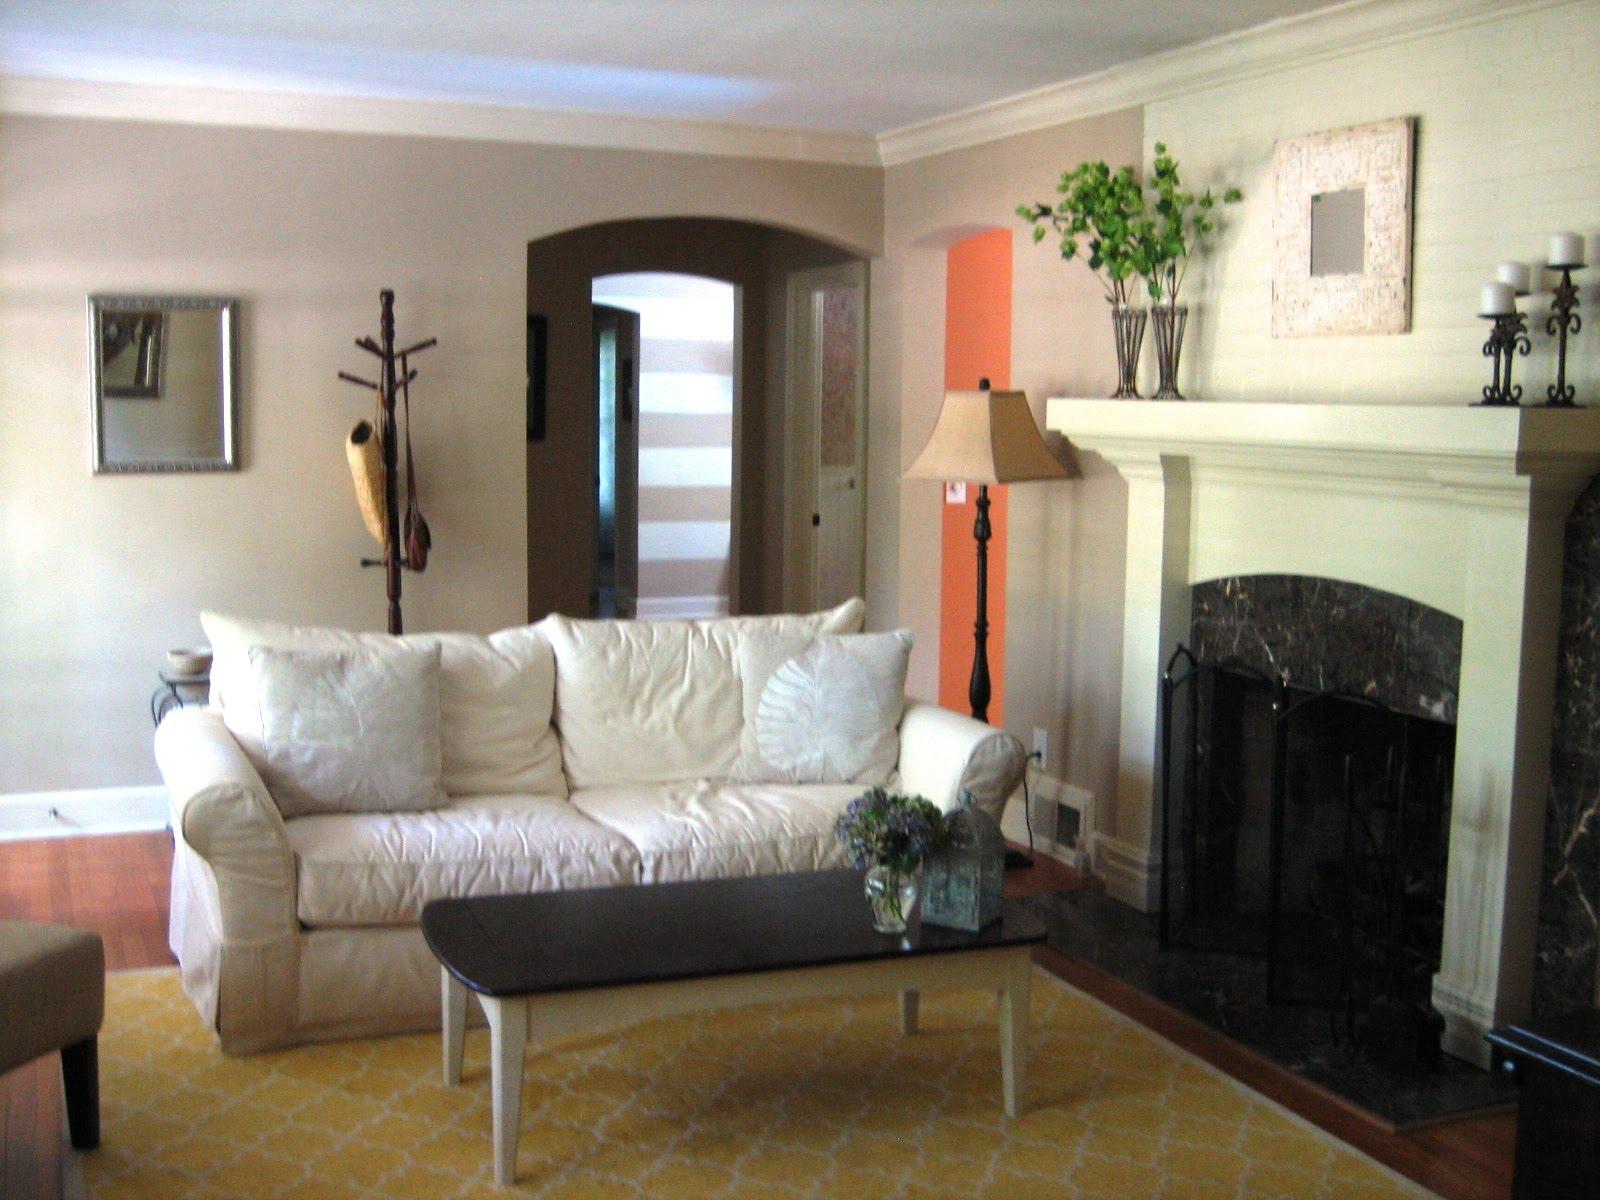 Interior Design Living Room Color Scheme